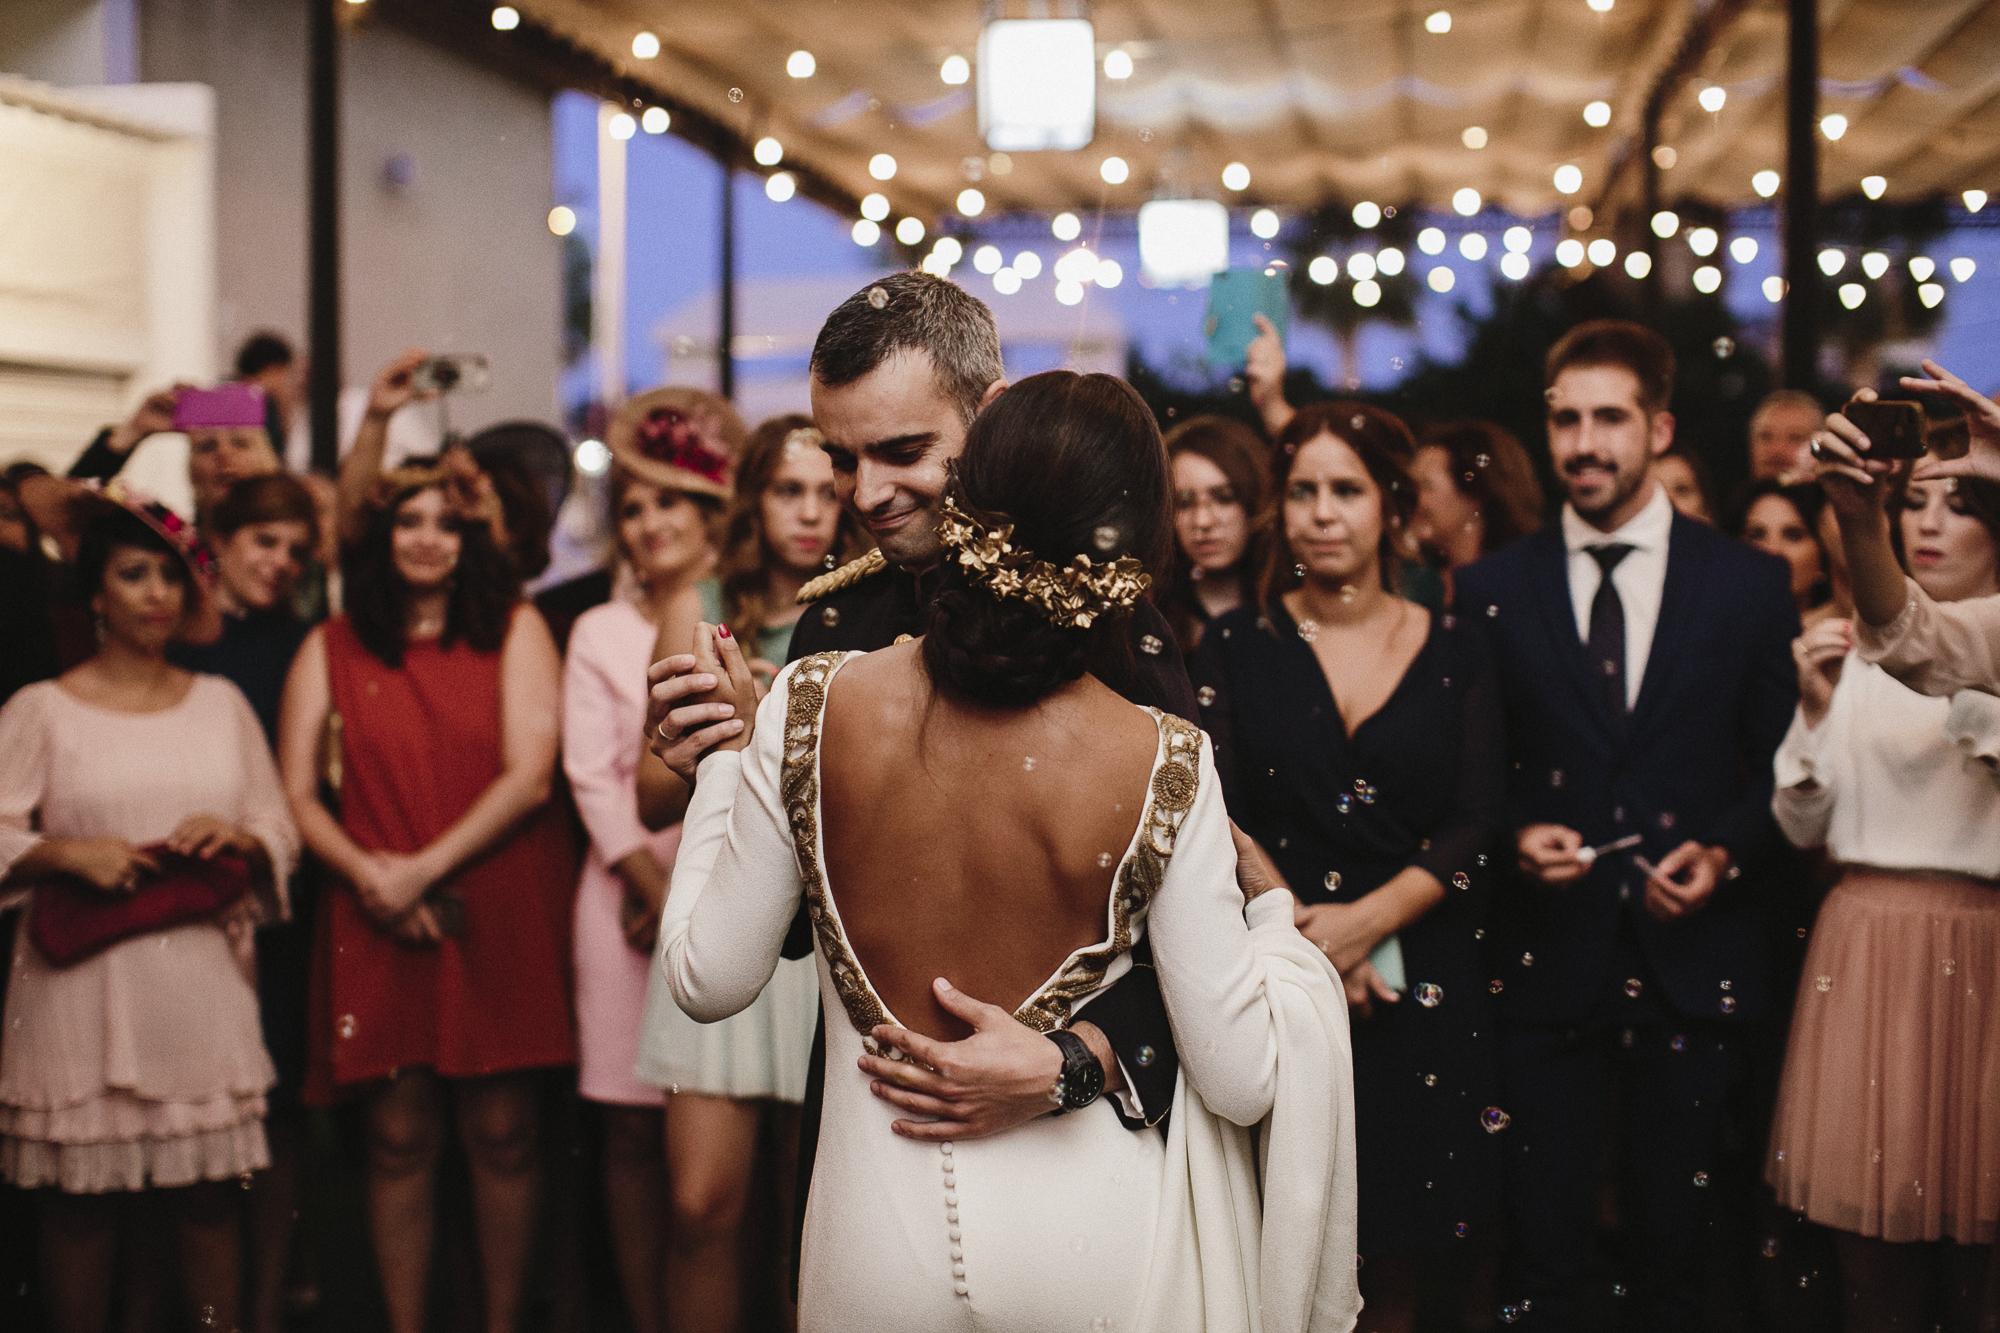 alfonso_flores_destination_wedding_photogrpaher_españa-134.jpg